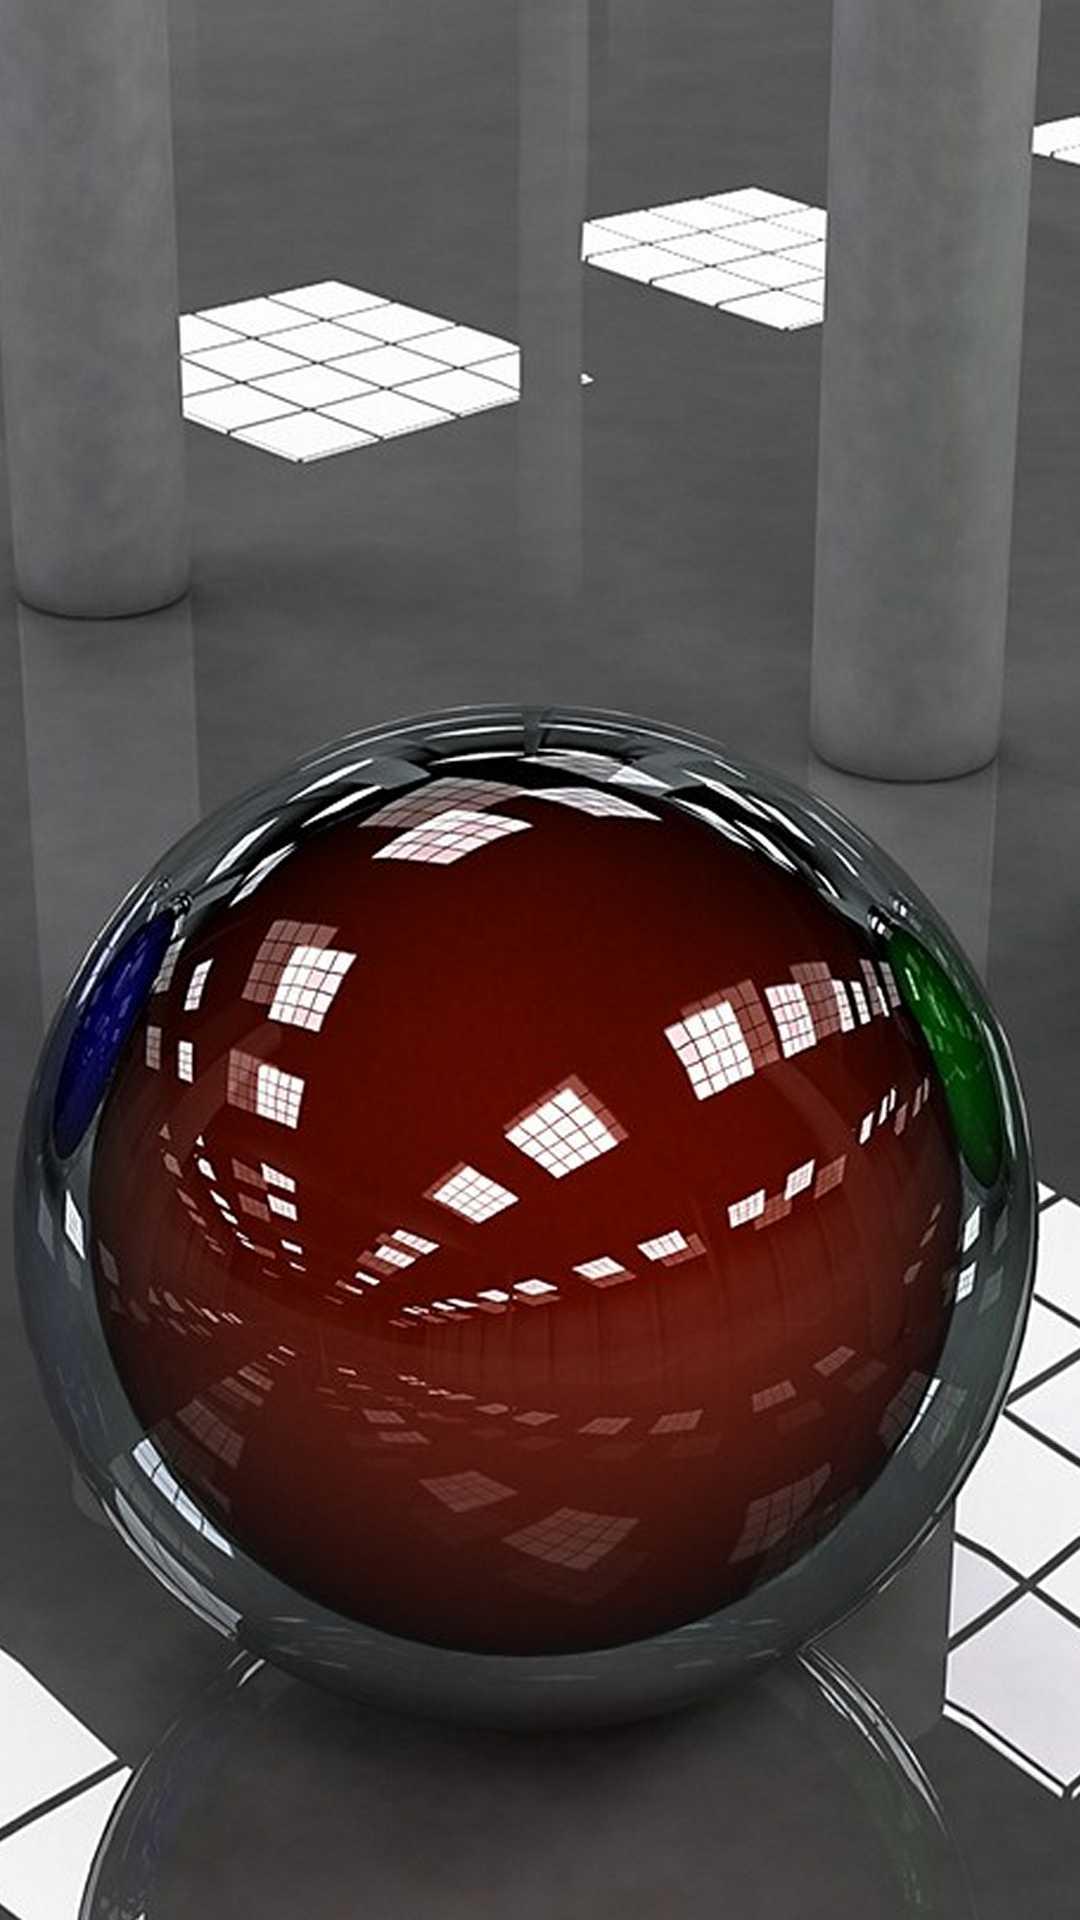 3D Phone Wallpaper [1080x1920] - 073